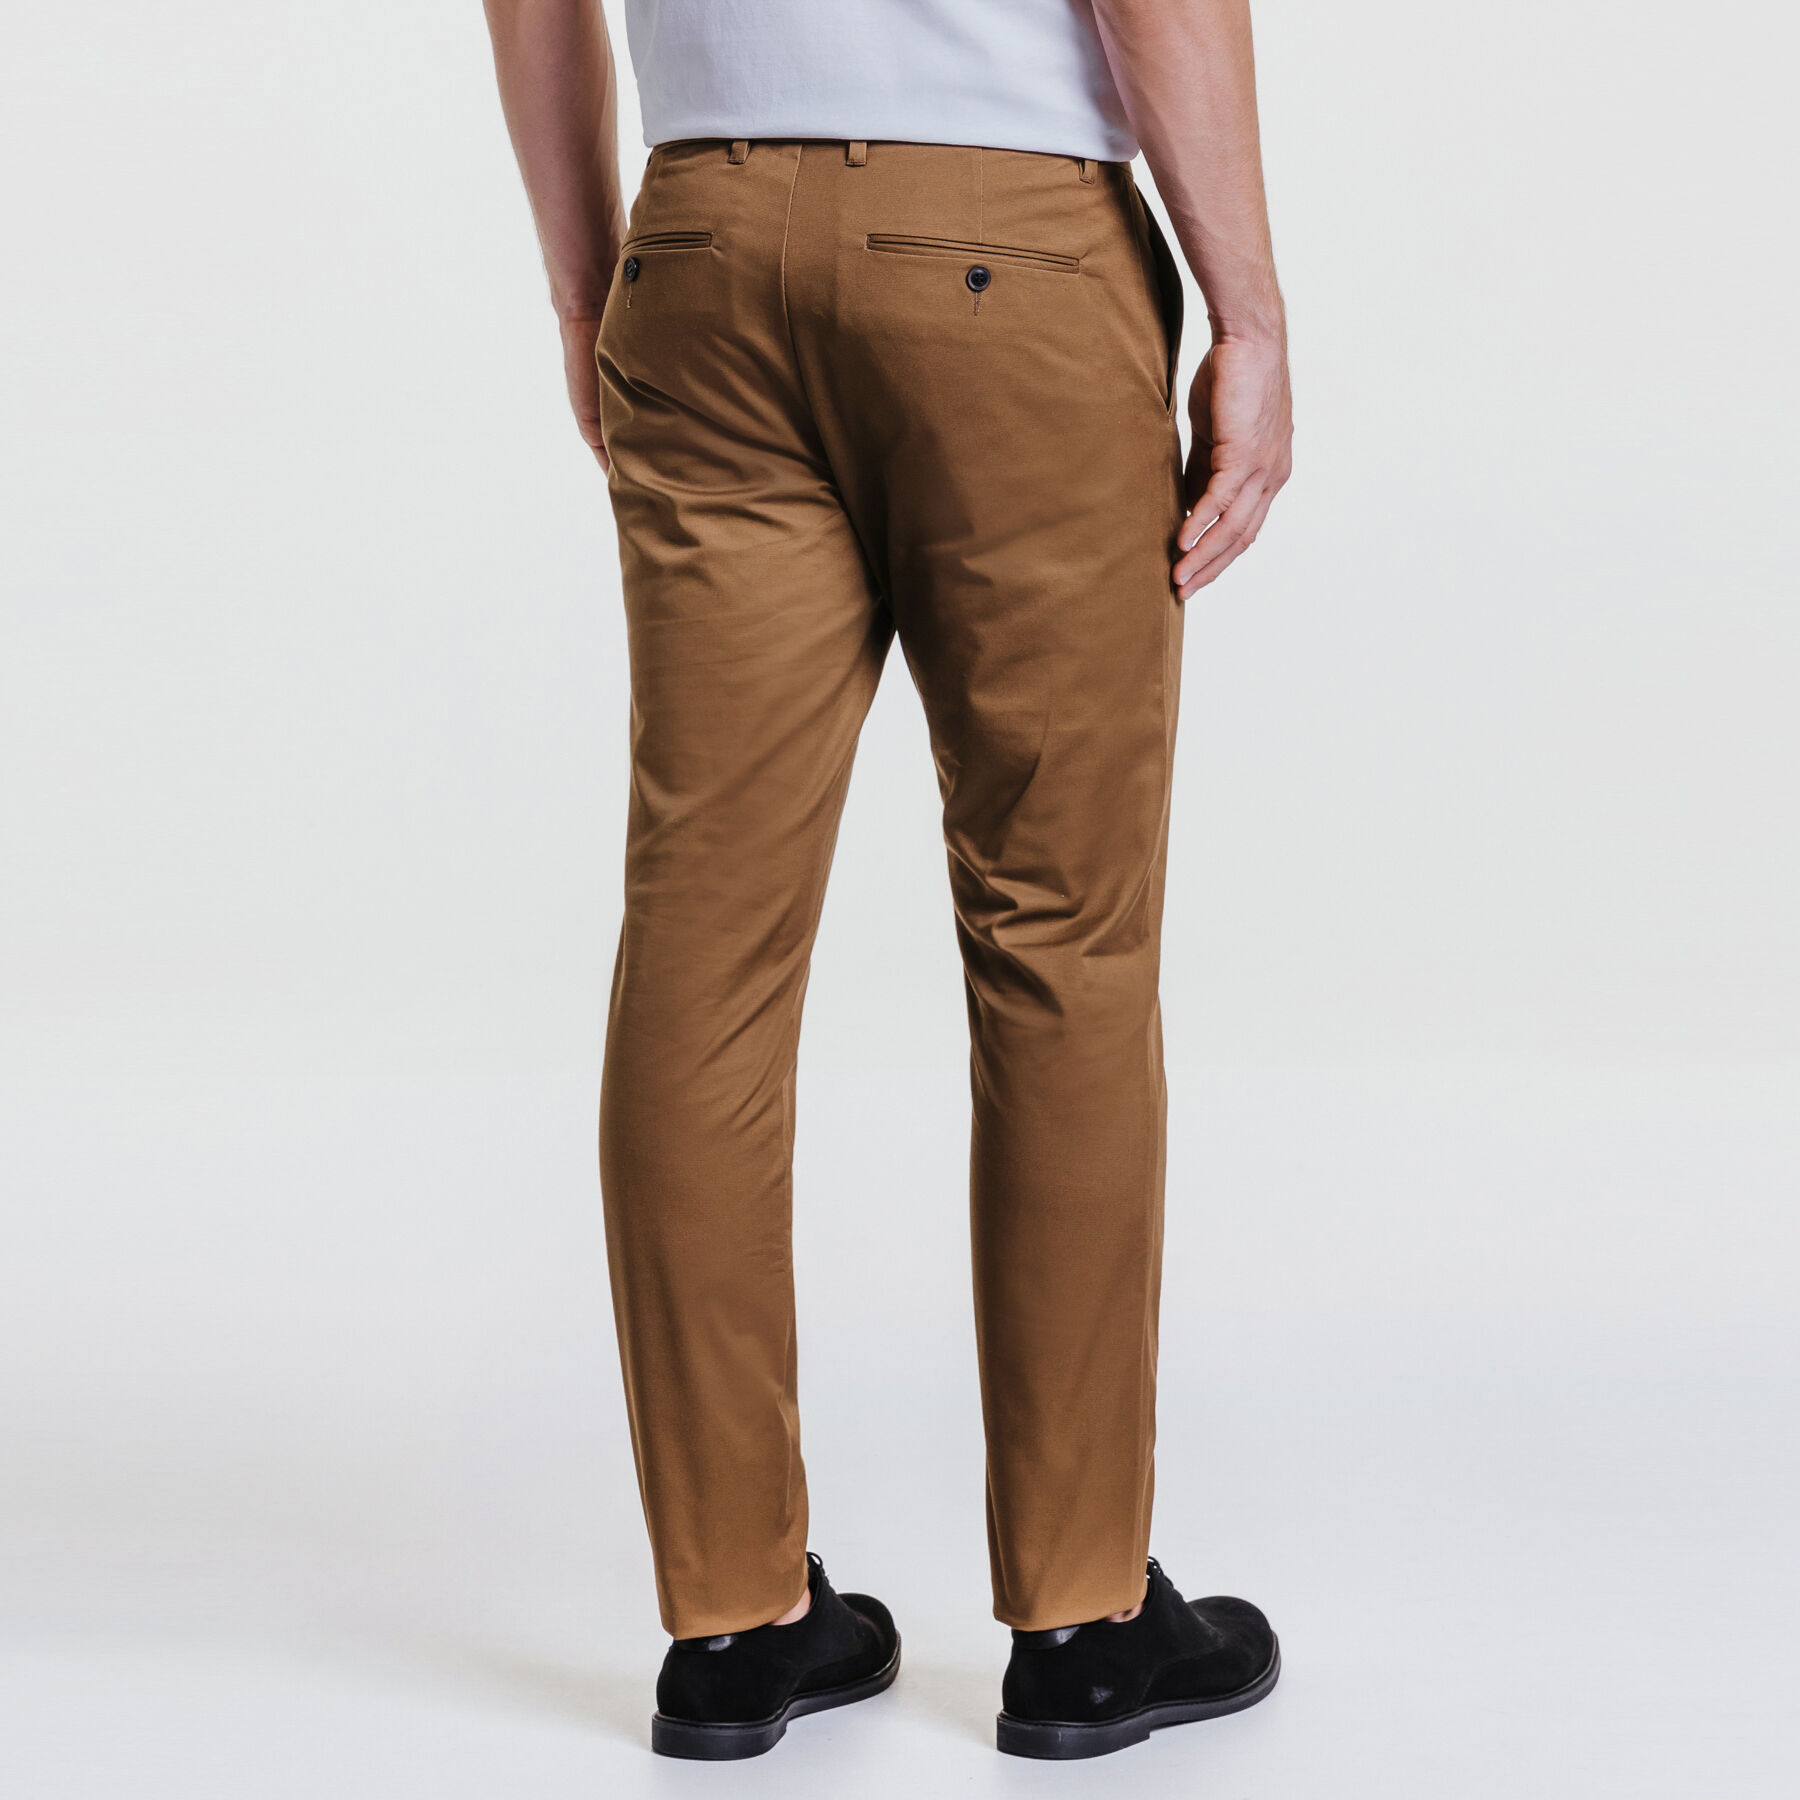 Pantalon Camel Stretch Coton Slim Chino Homme Jules CtxBQdrsh